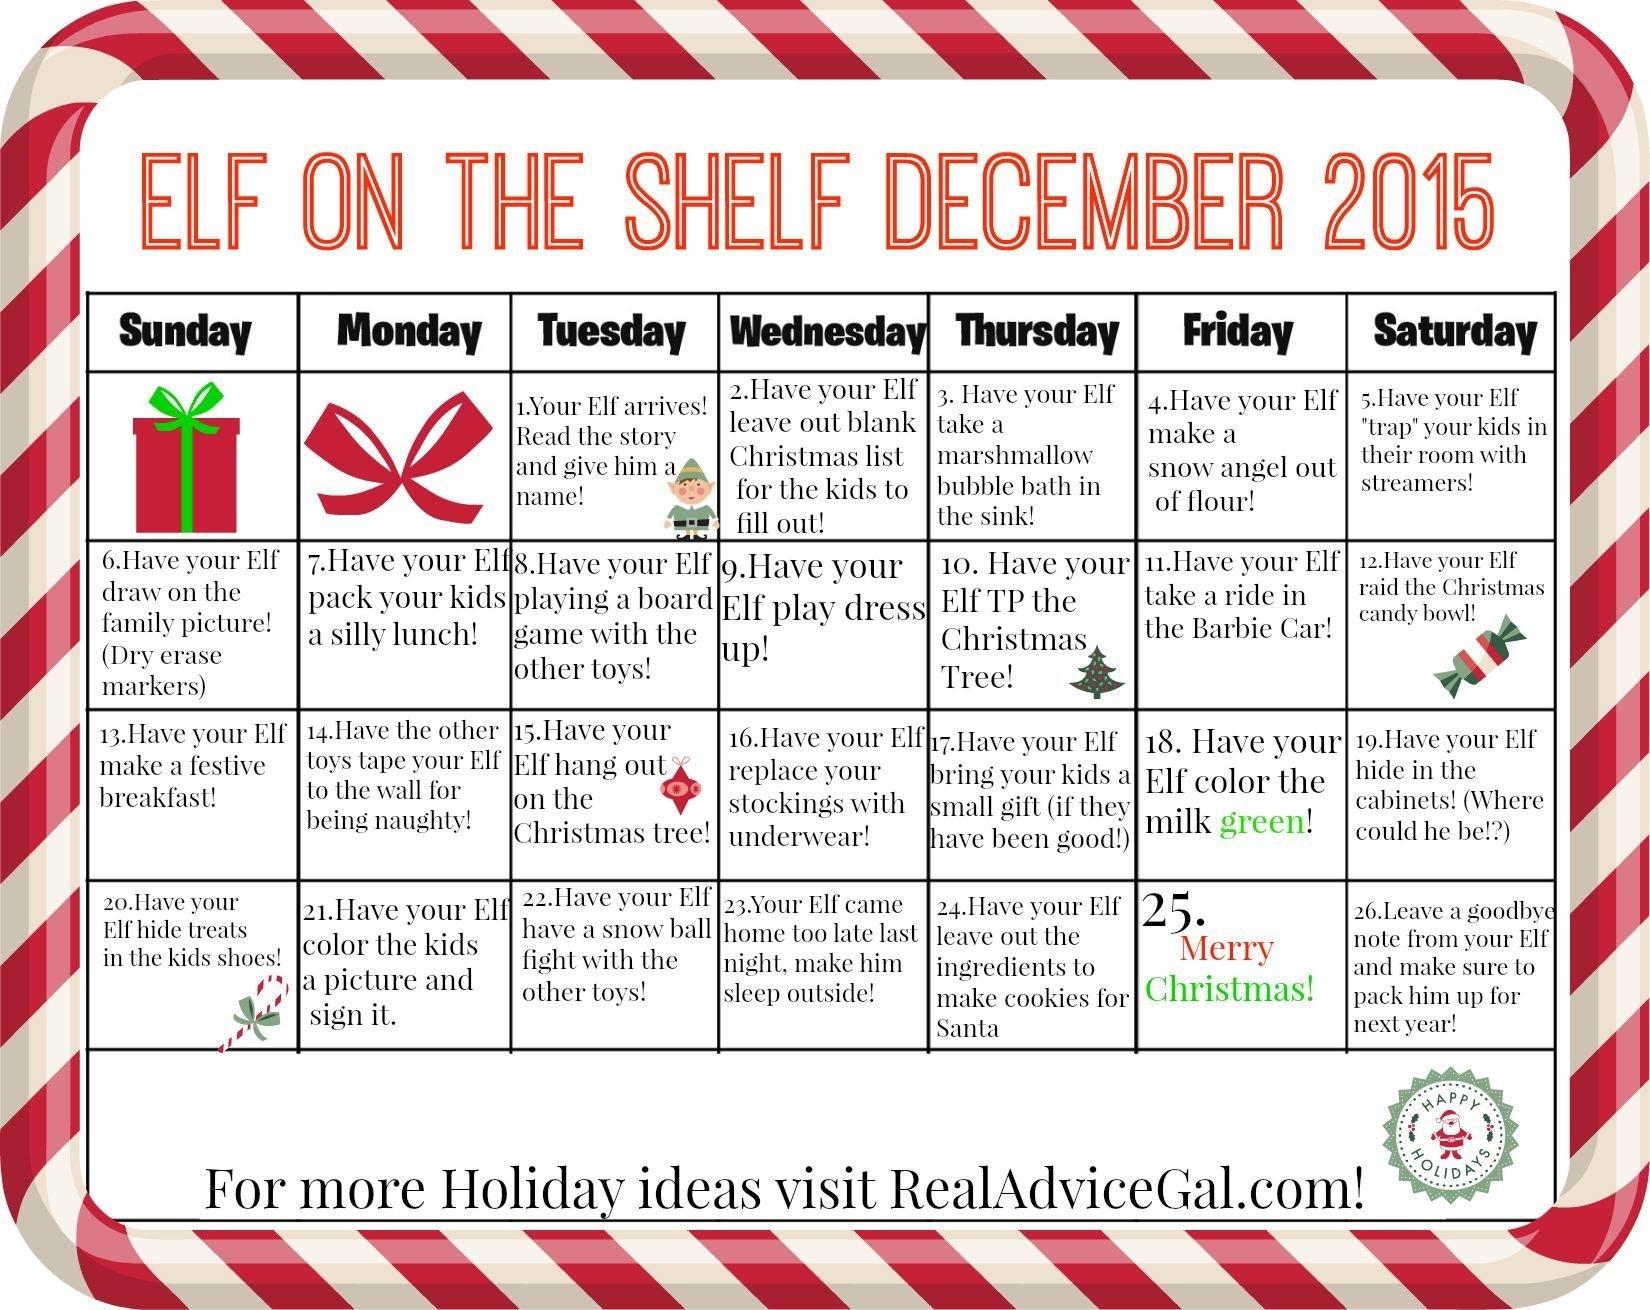 Elf On The Shelf Calendar - Ideas For December | X-Mas | Elf On The for 12 Month Photo Calendar Ideas Naughty